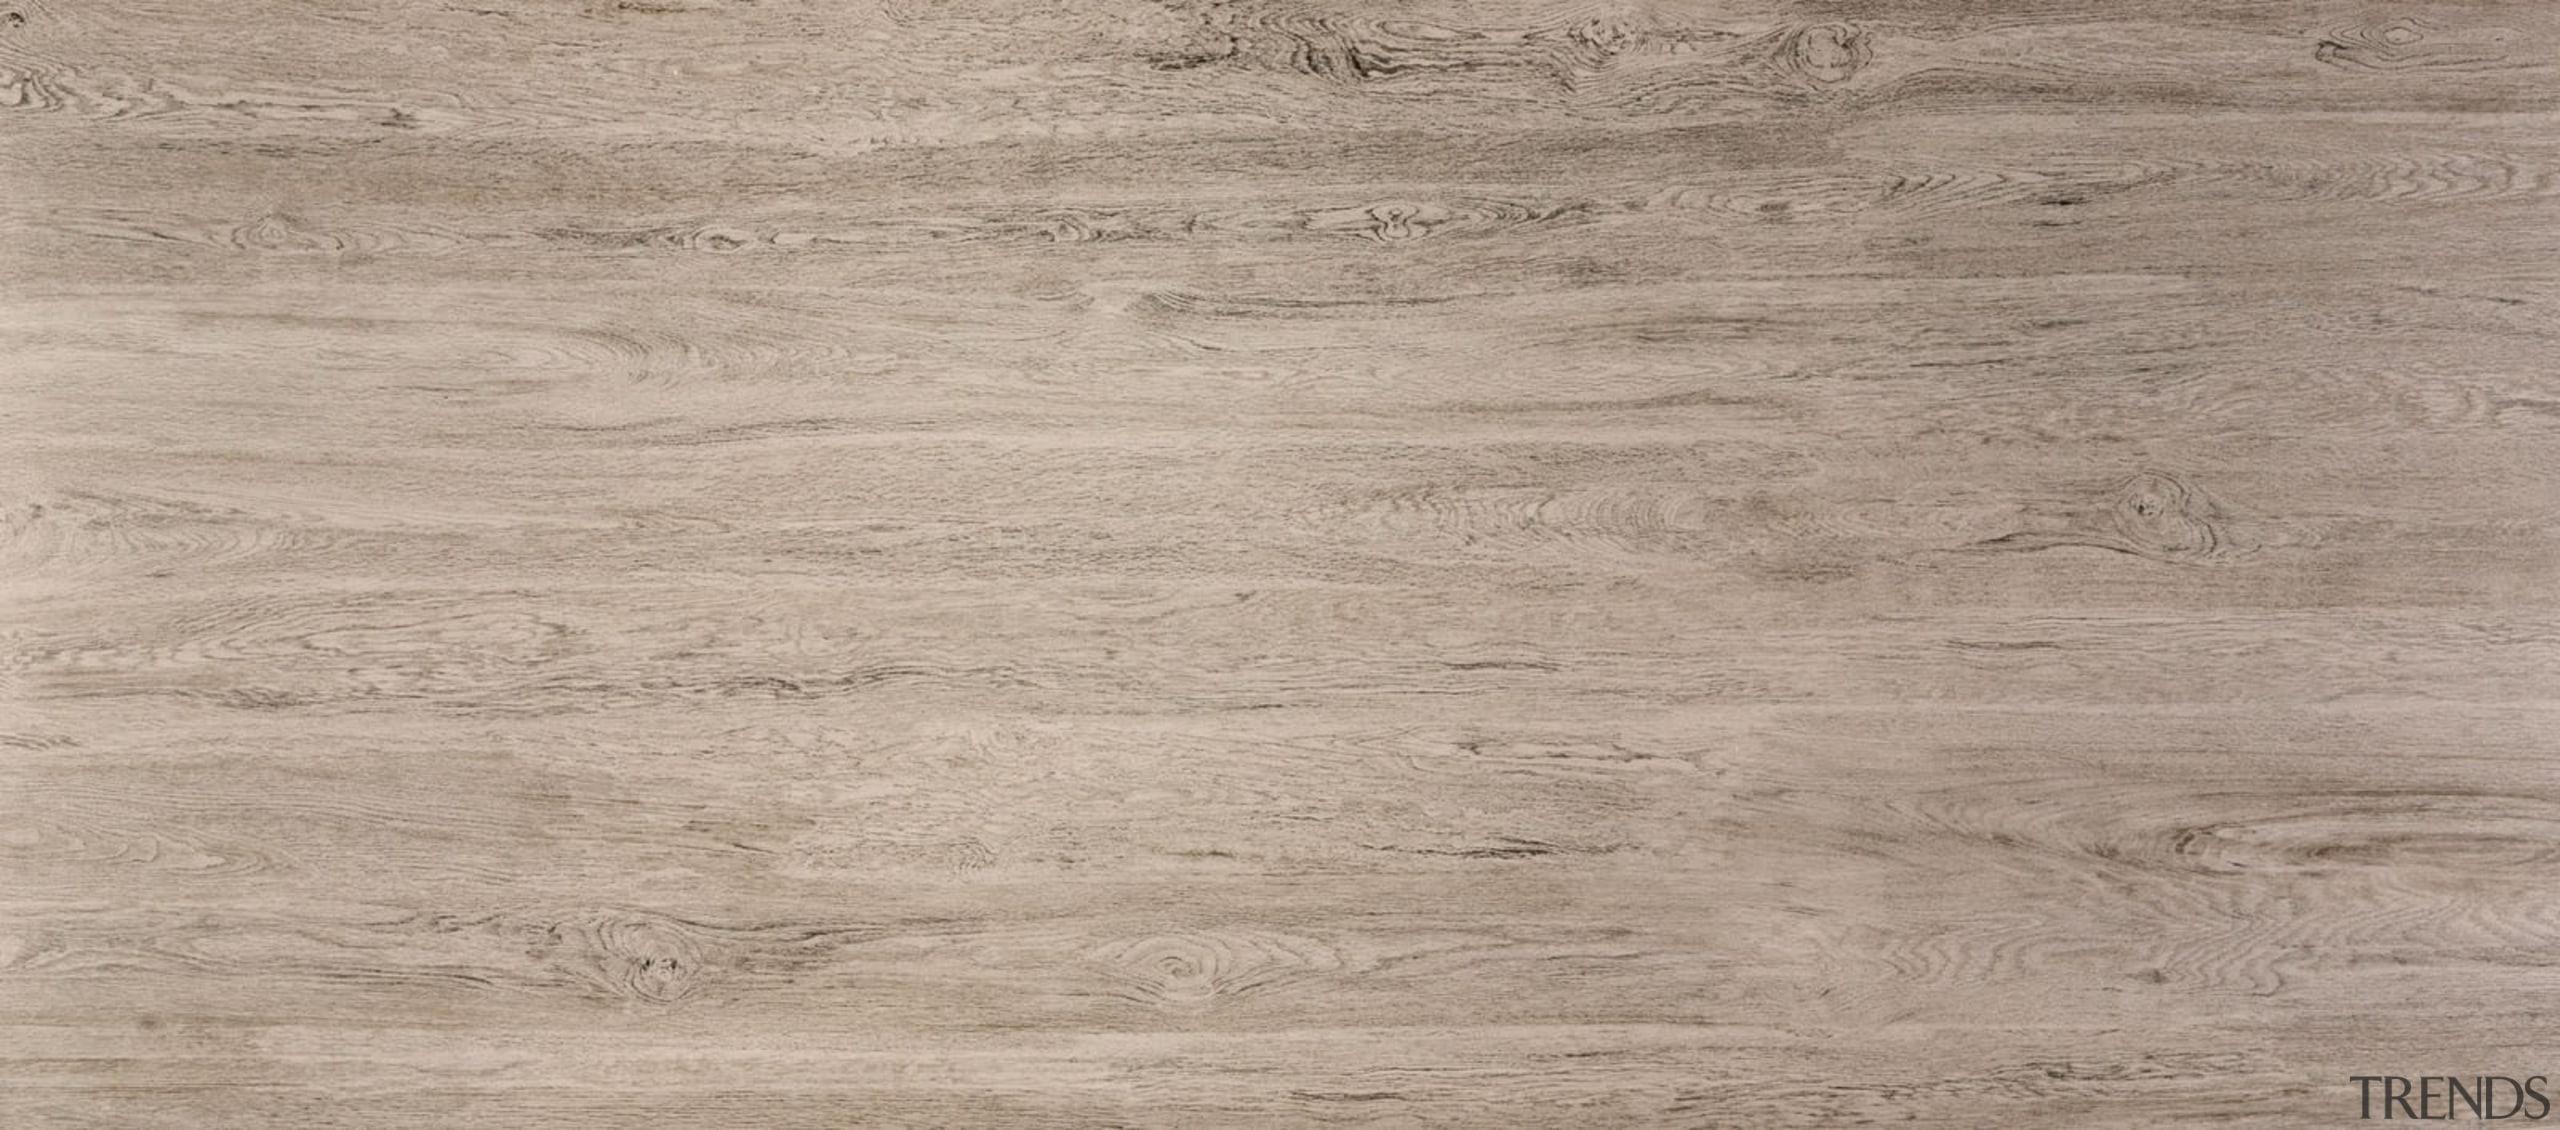 Dekton - black and white   texture   black and white, texture, wood, gray